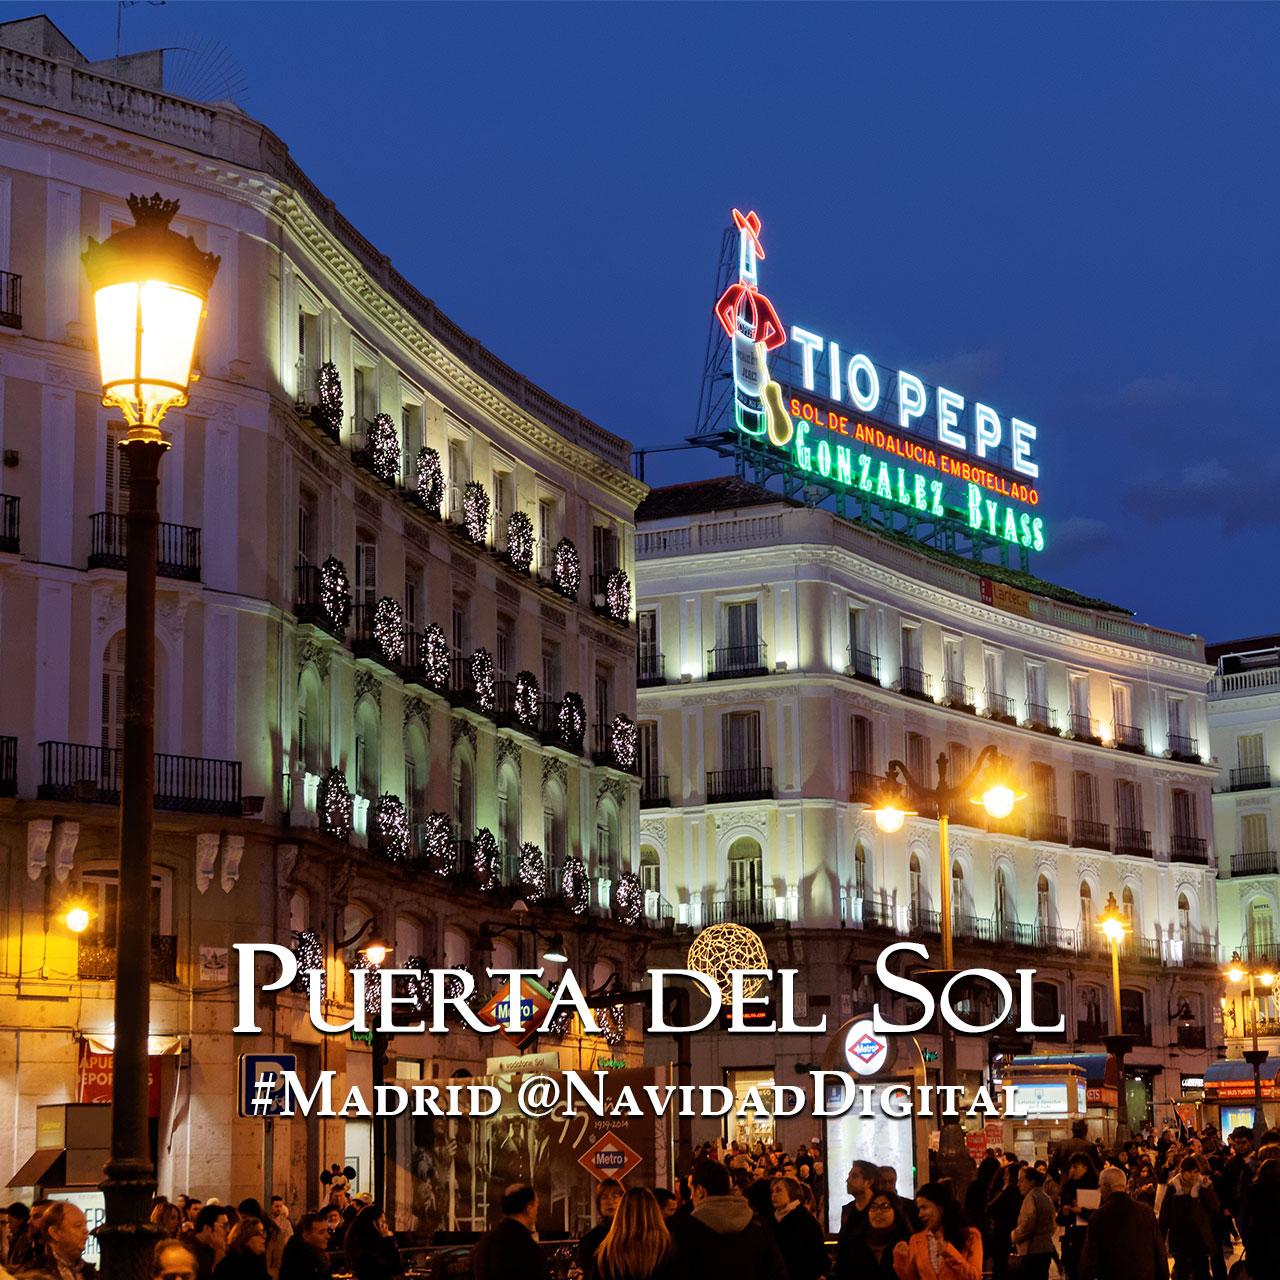 Especial navidad madrid 2014 2015 el blog de navidad digital for Tio pepe puerta del sol madrid